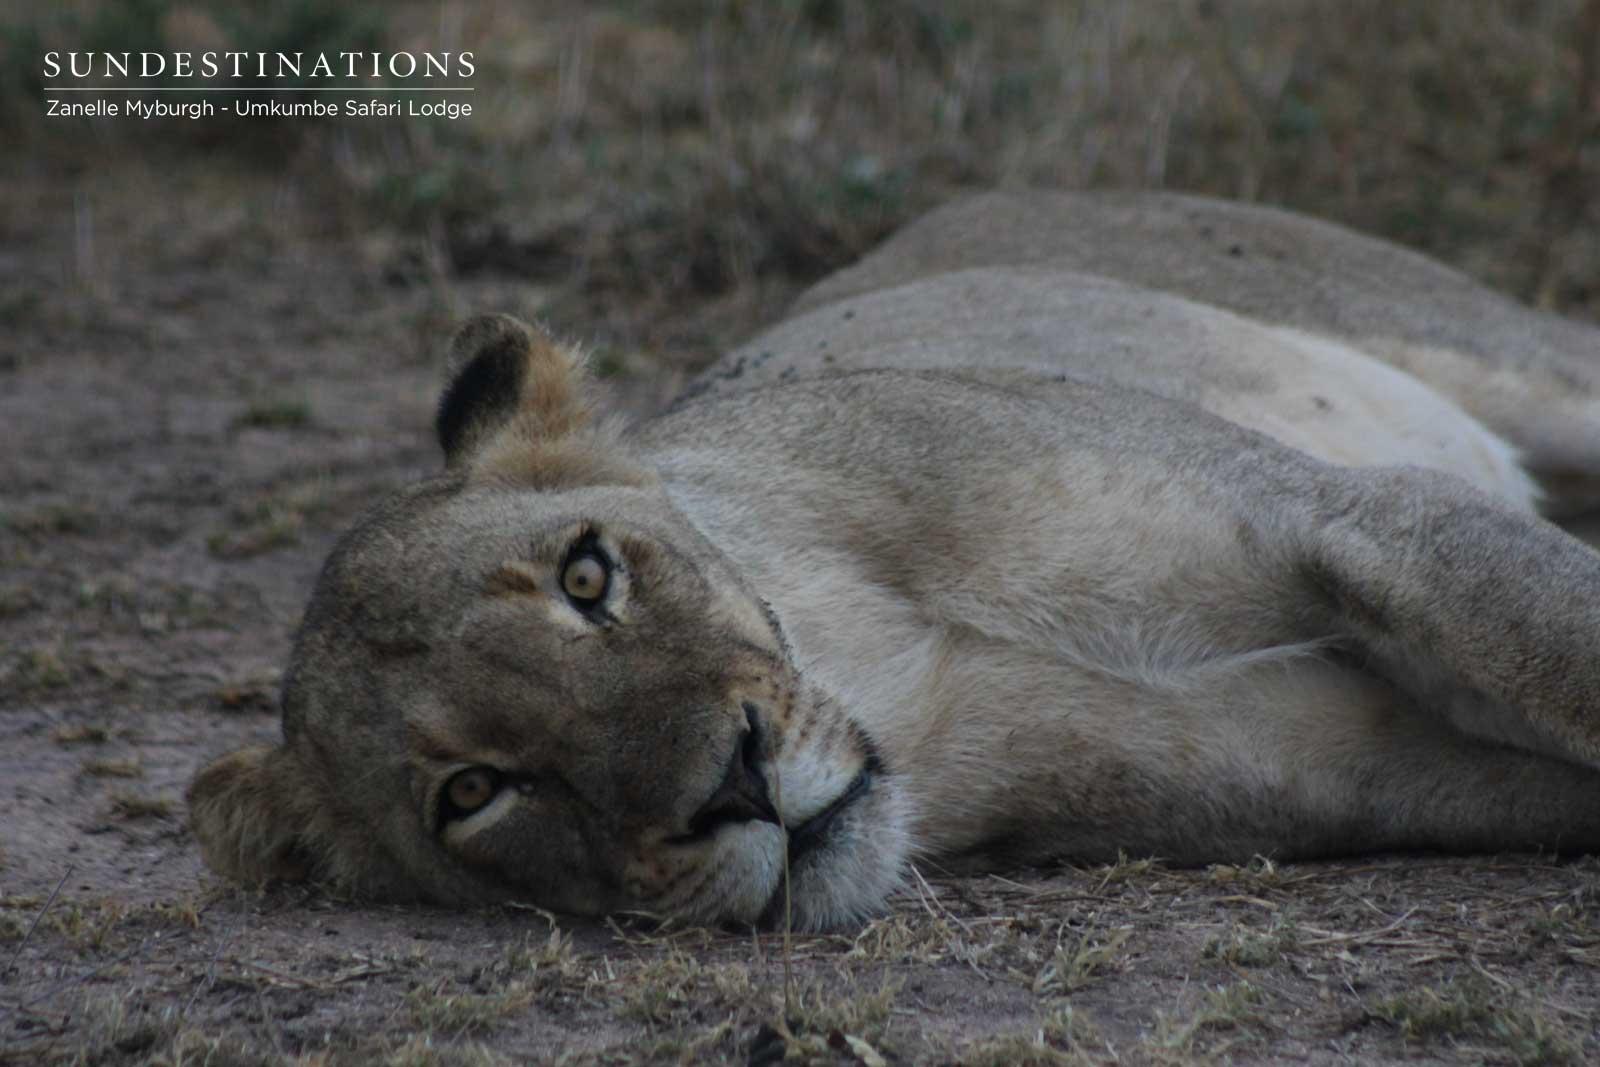 Sabi Sand Lions